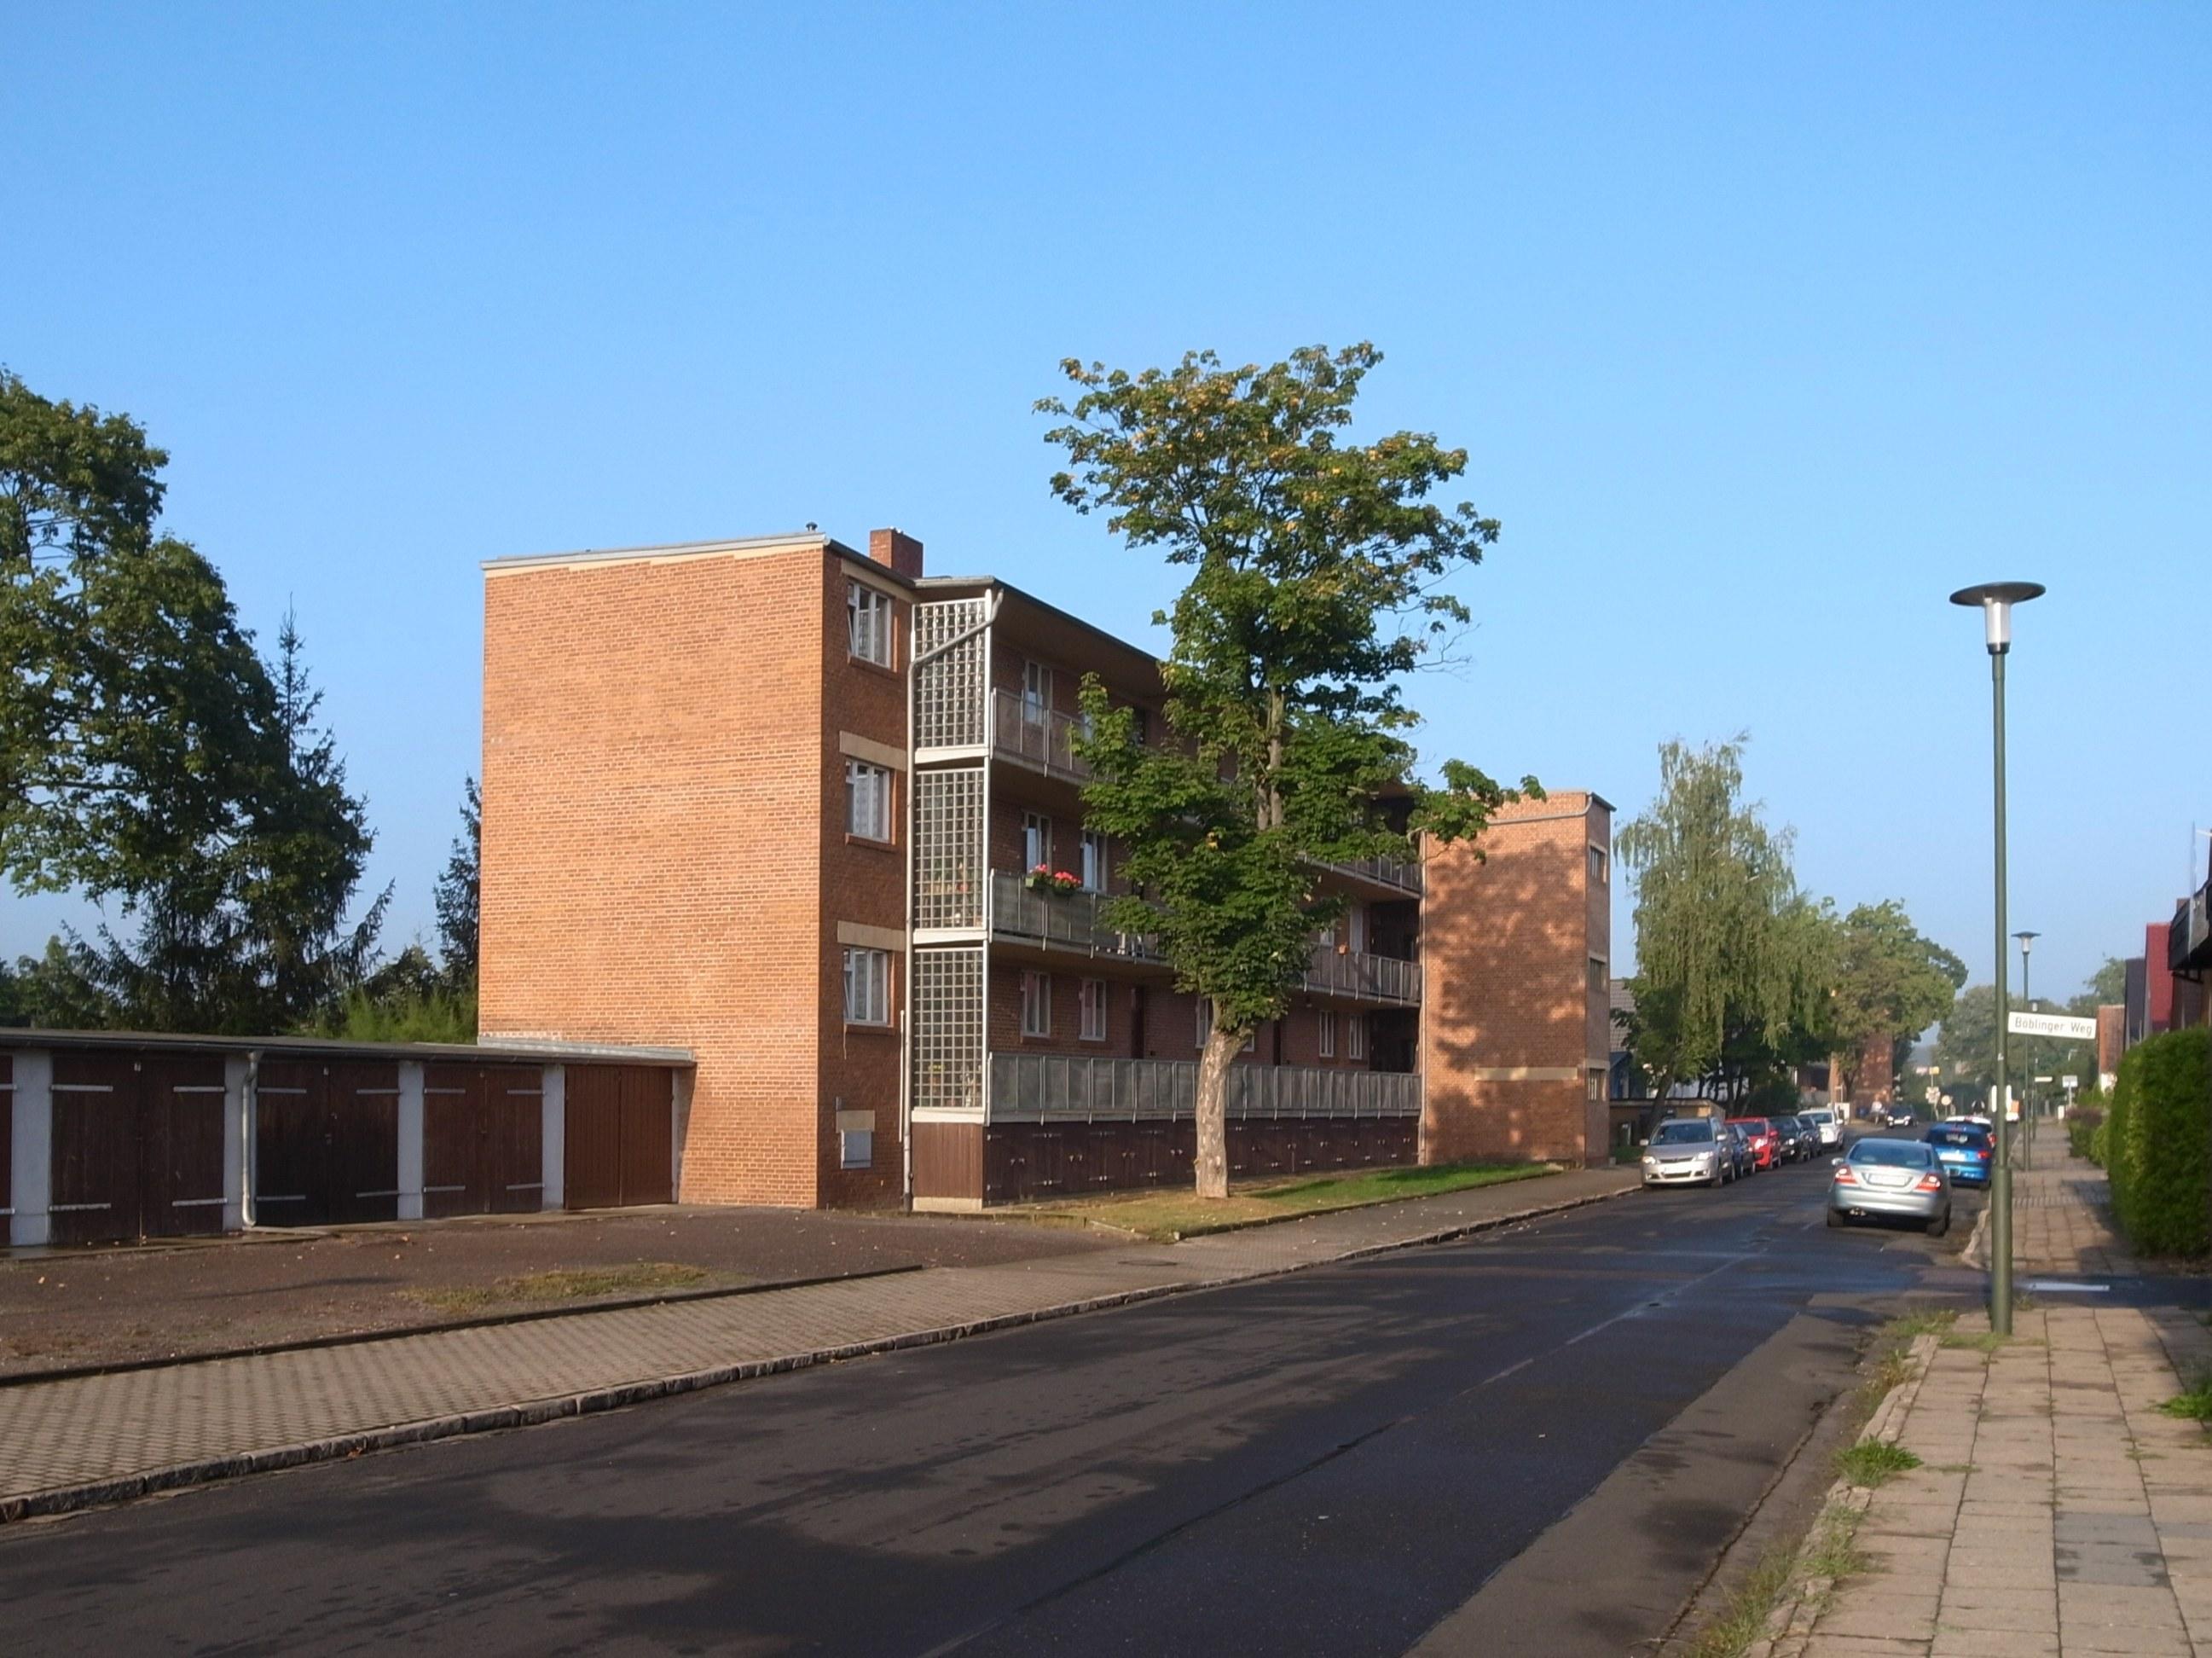 Bauhaus Architektur file dessau bauhaus architektur laubenganghaus mittelbreite14 jpg